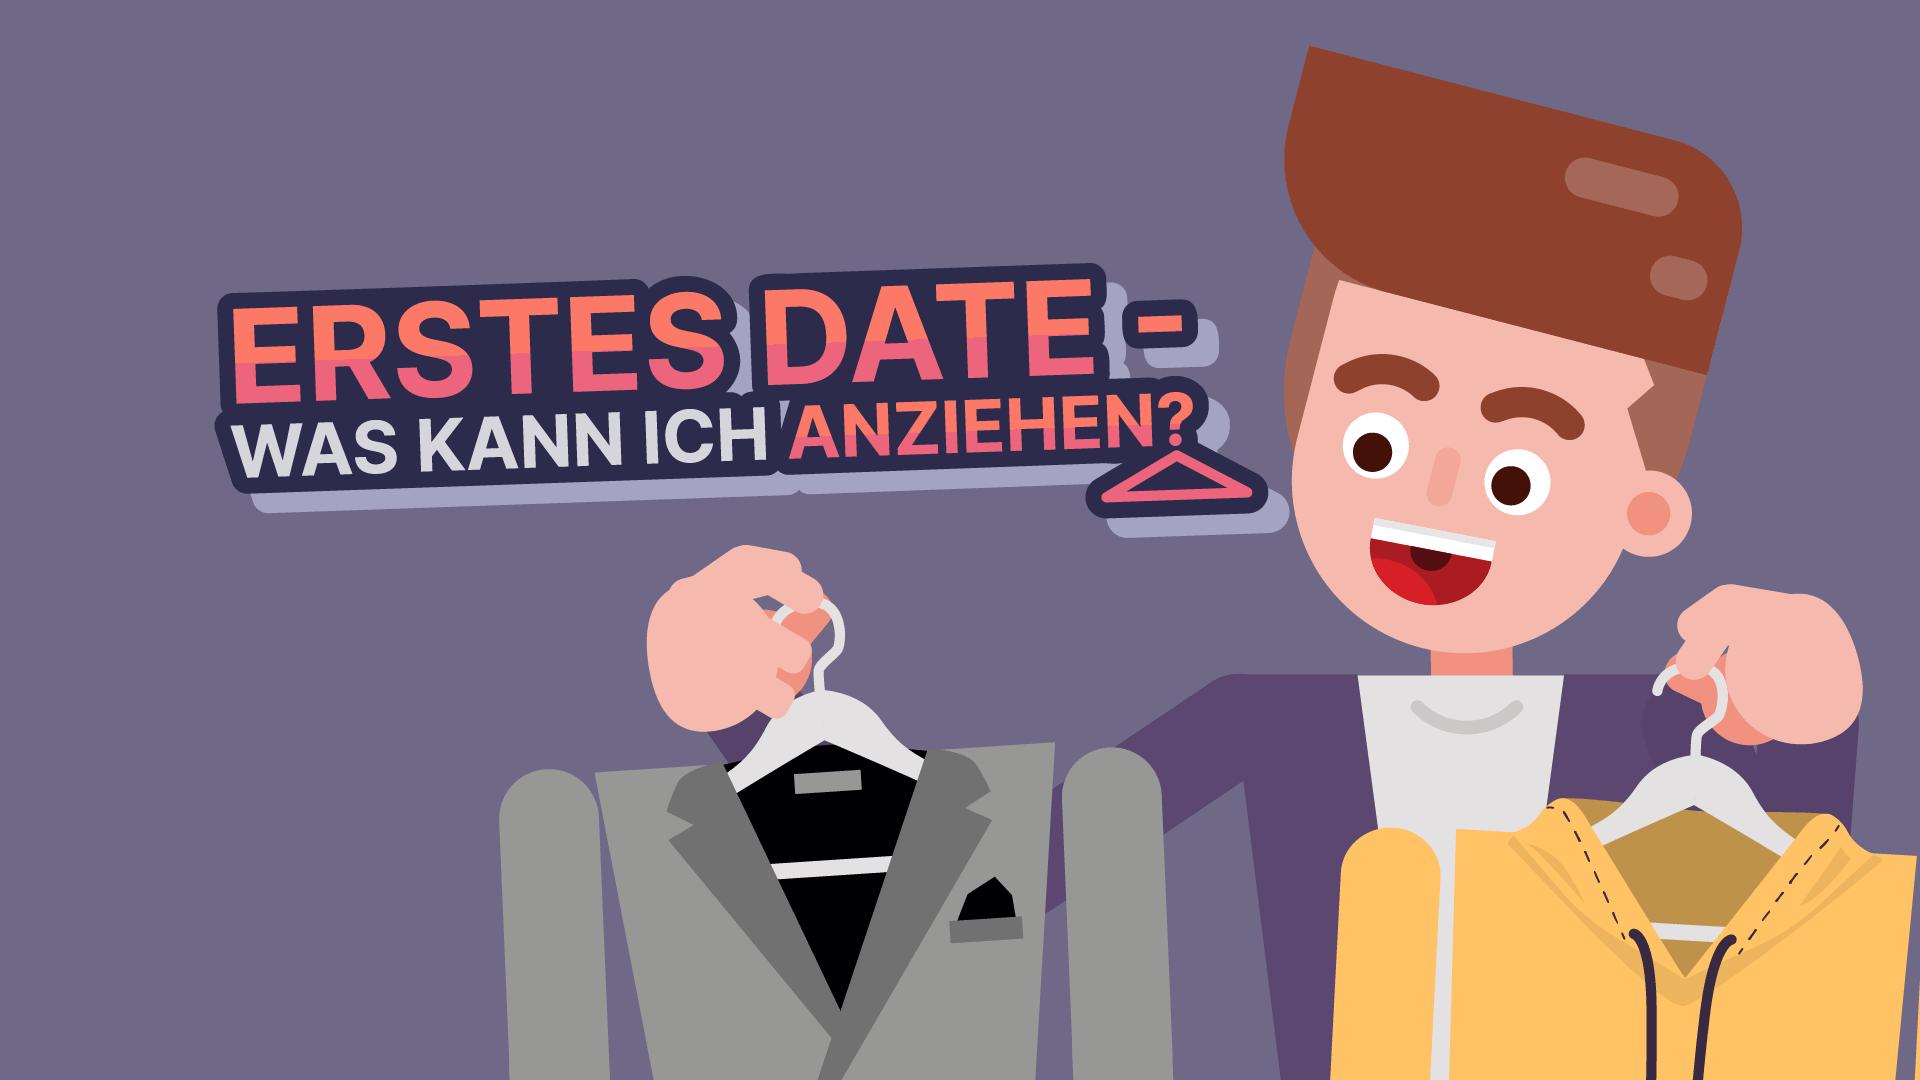 Online-dating-beratung nach dem ersten date